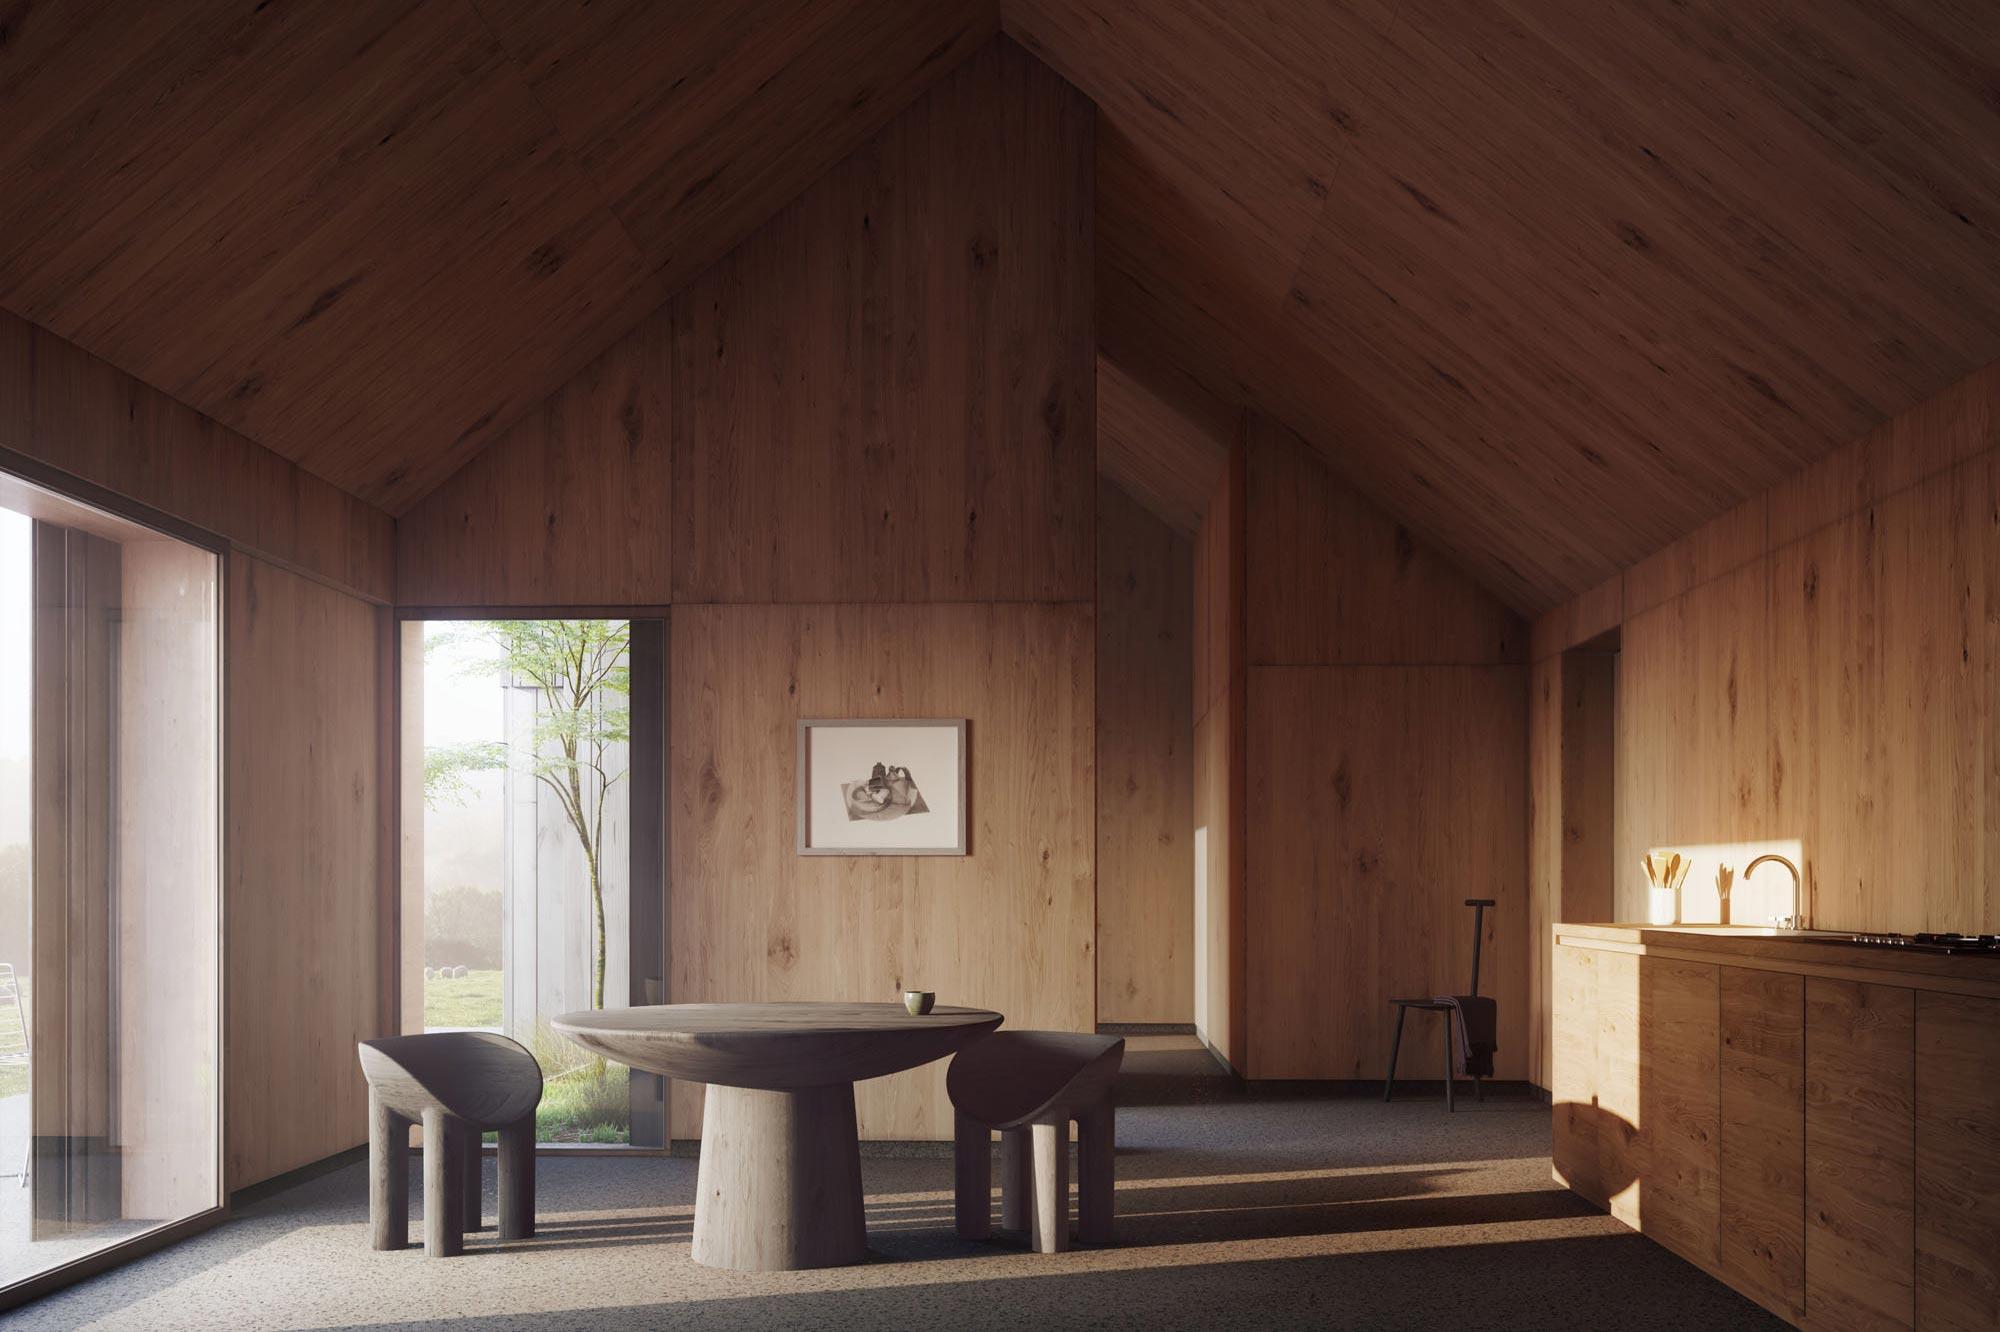 cube-haus-faye-toogood-architects-cs-2000px-03